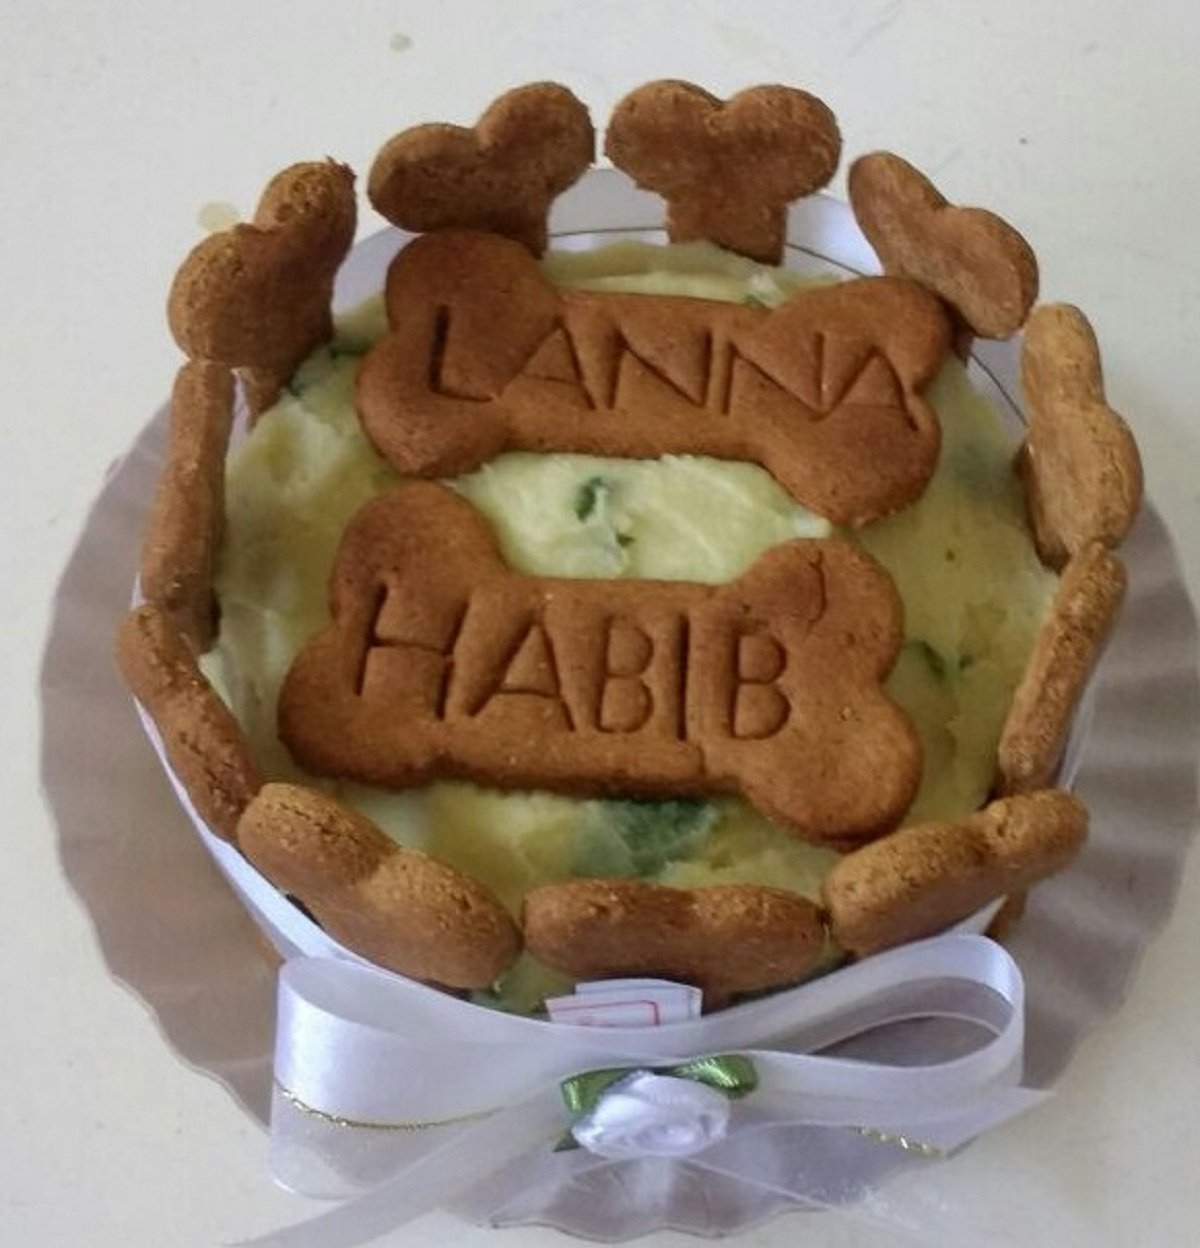 A festa de casamento teve biscoitos personalizados